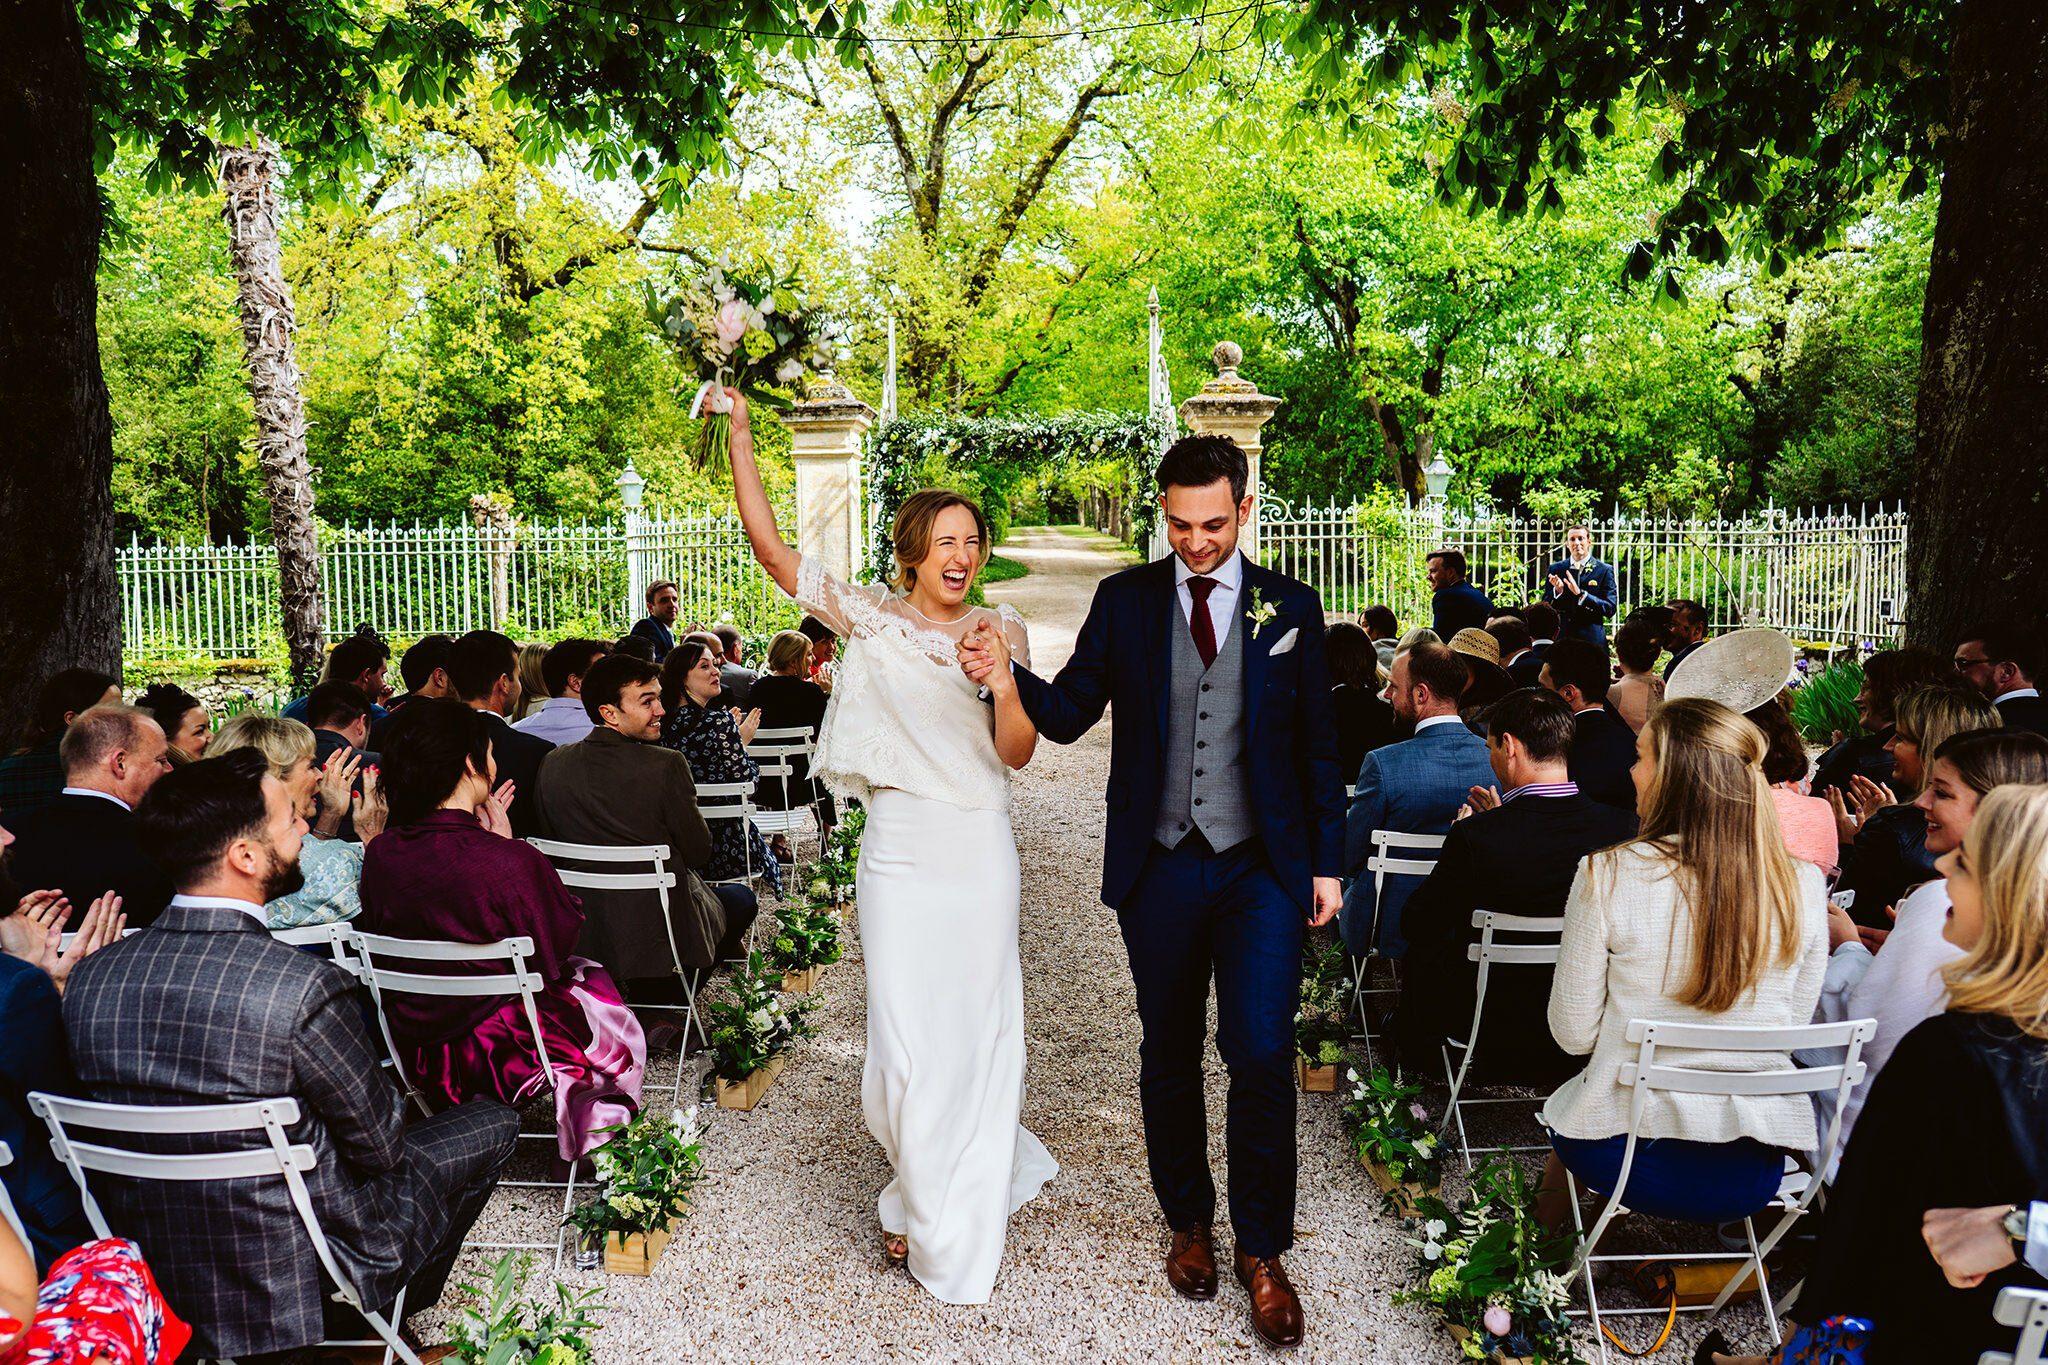 Chateau Lartigolle wedding ceremony